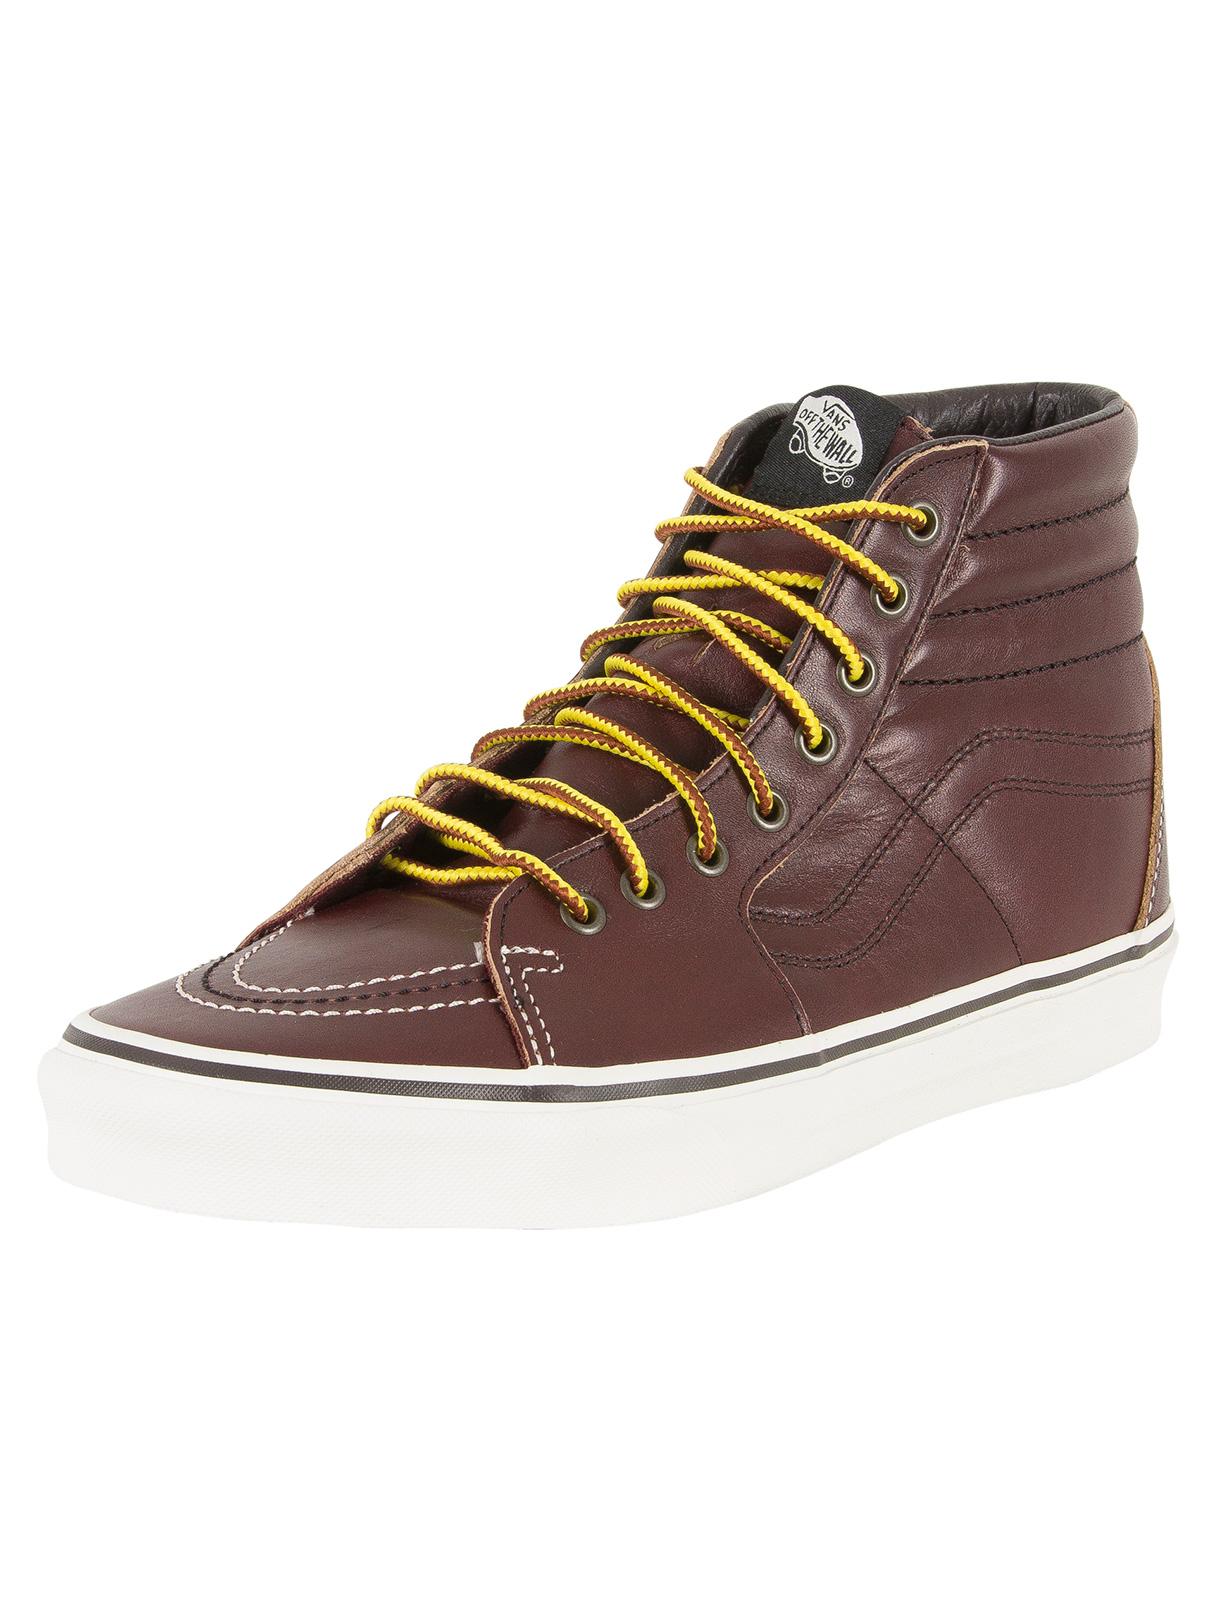 Vans Sk8 Hi Shoes UK 9.5 Groundbreakers Black Marshmallow amv7ZmWp